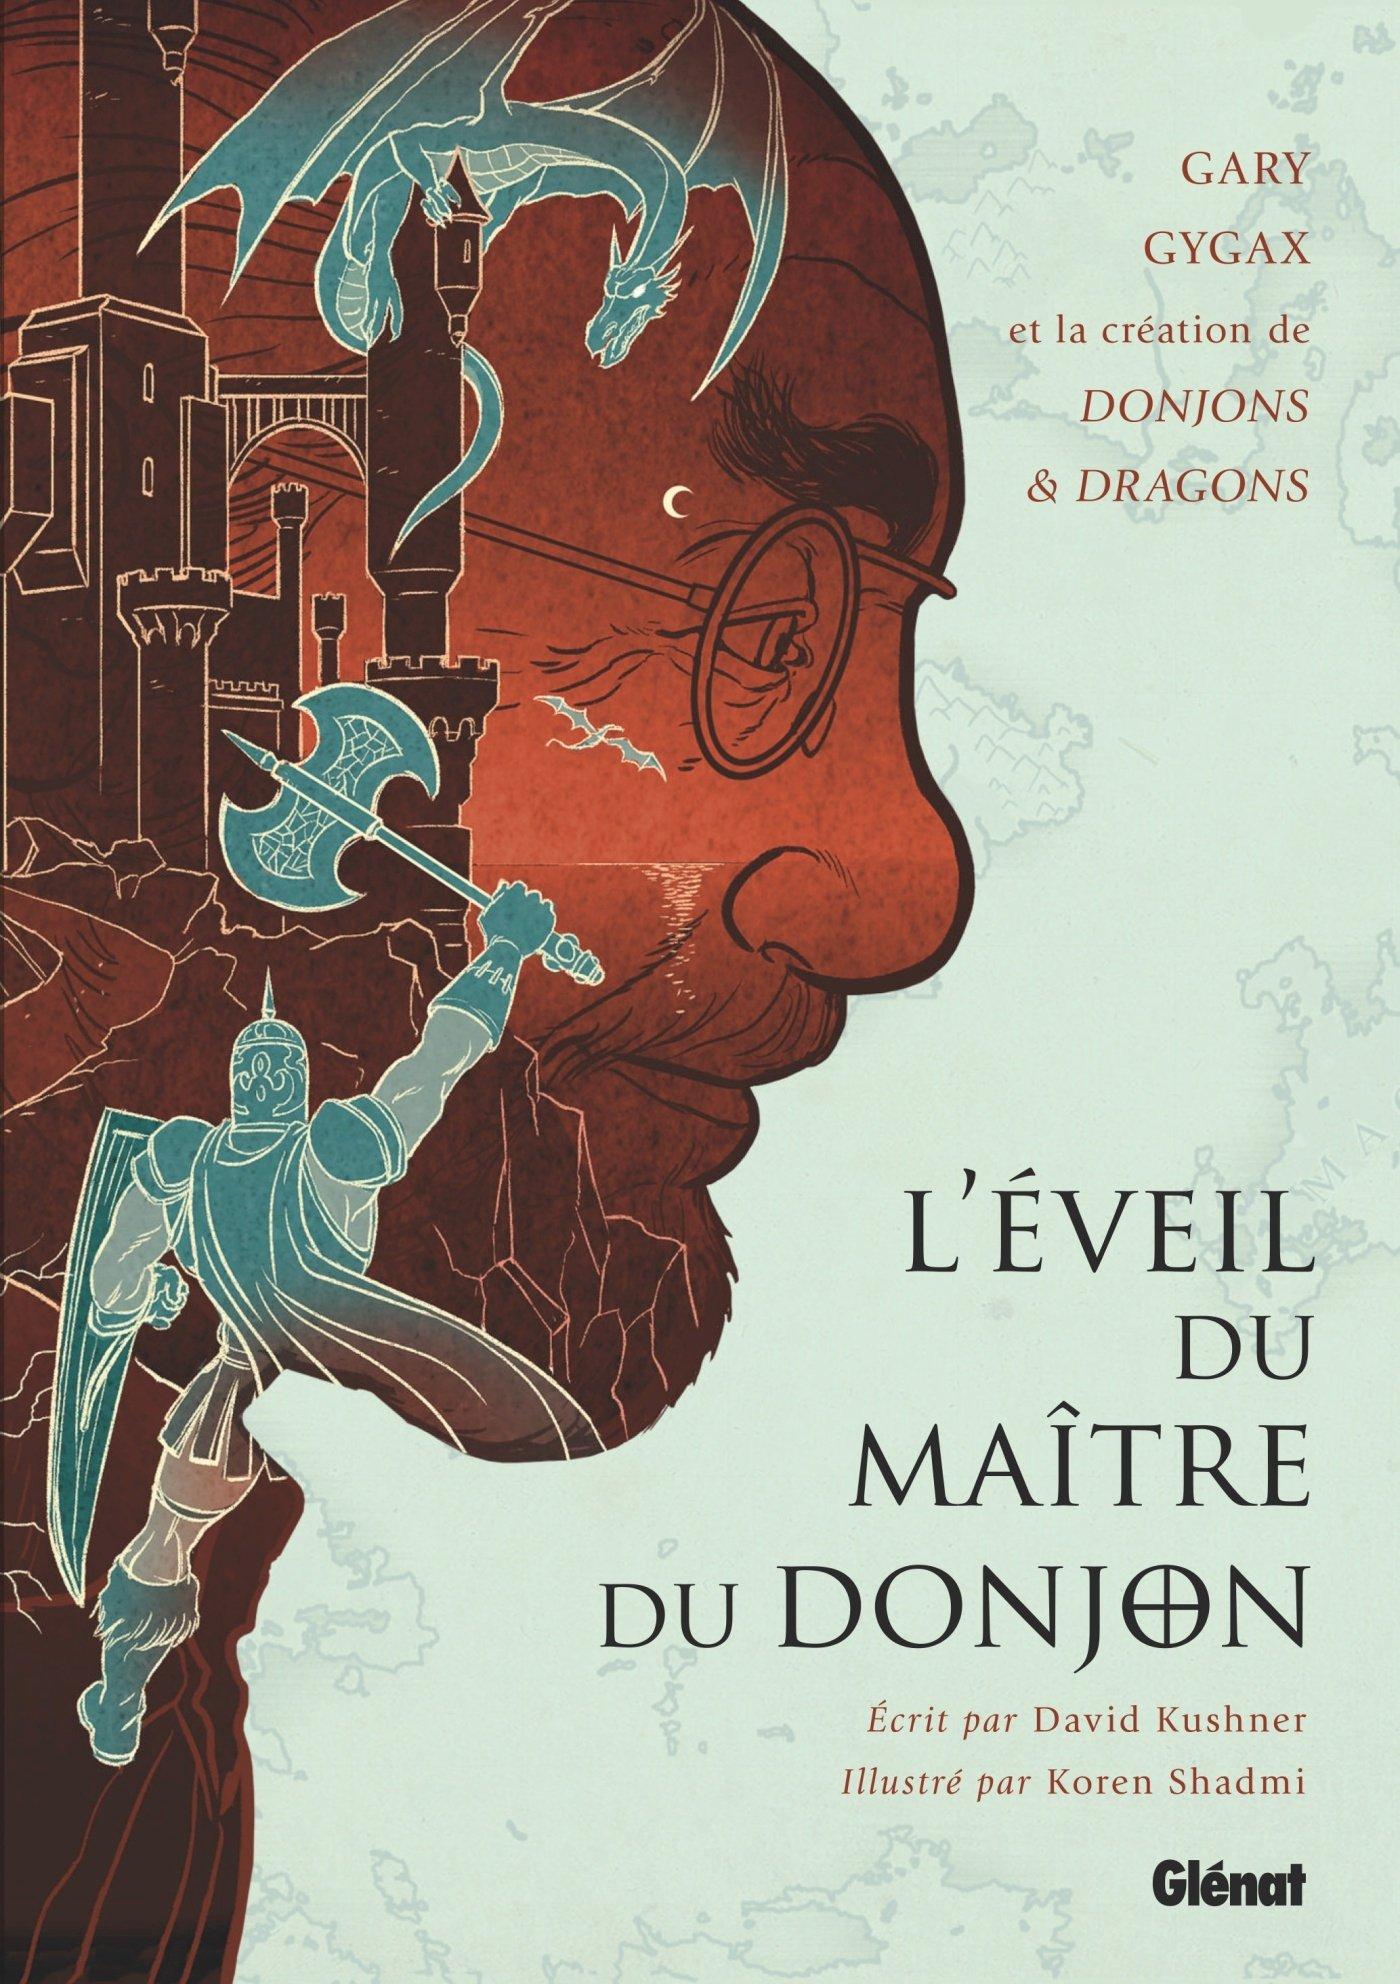 L'éveil du Maître du Donjon 1 - Gary Gygax et la création de Donjons & Dragons